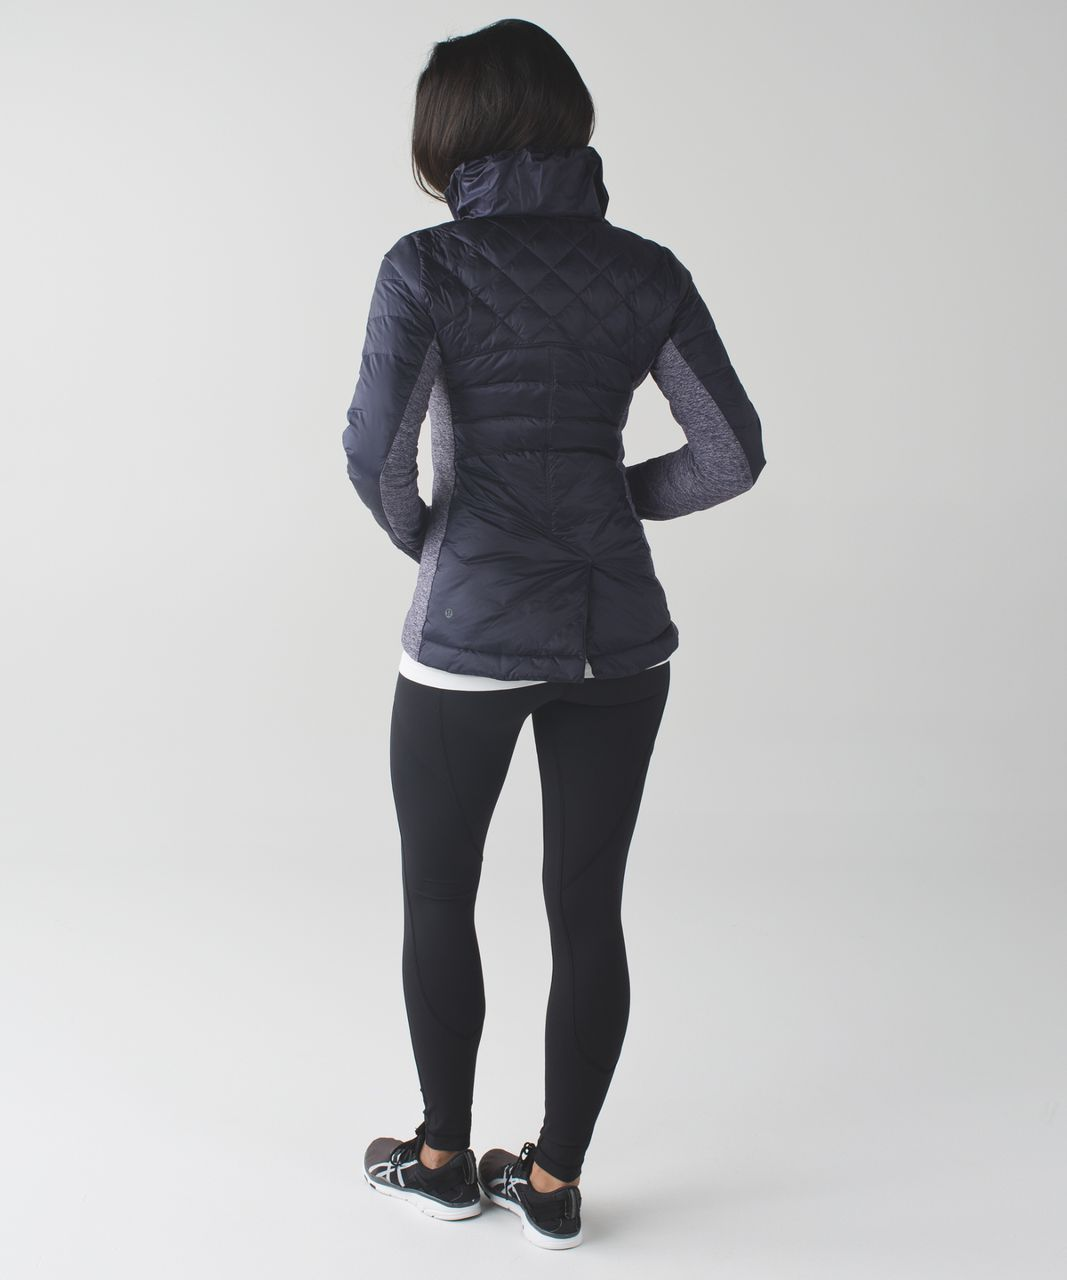 Down for a run jacket black lululemon